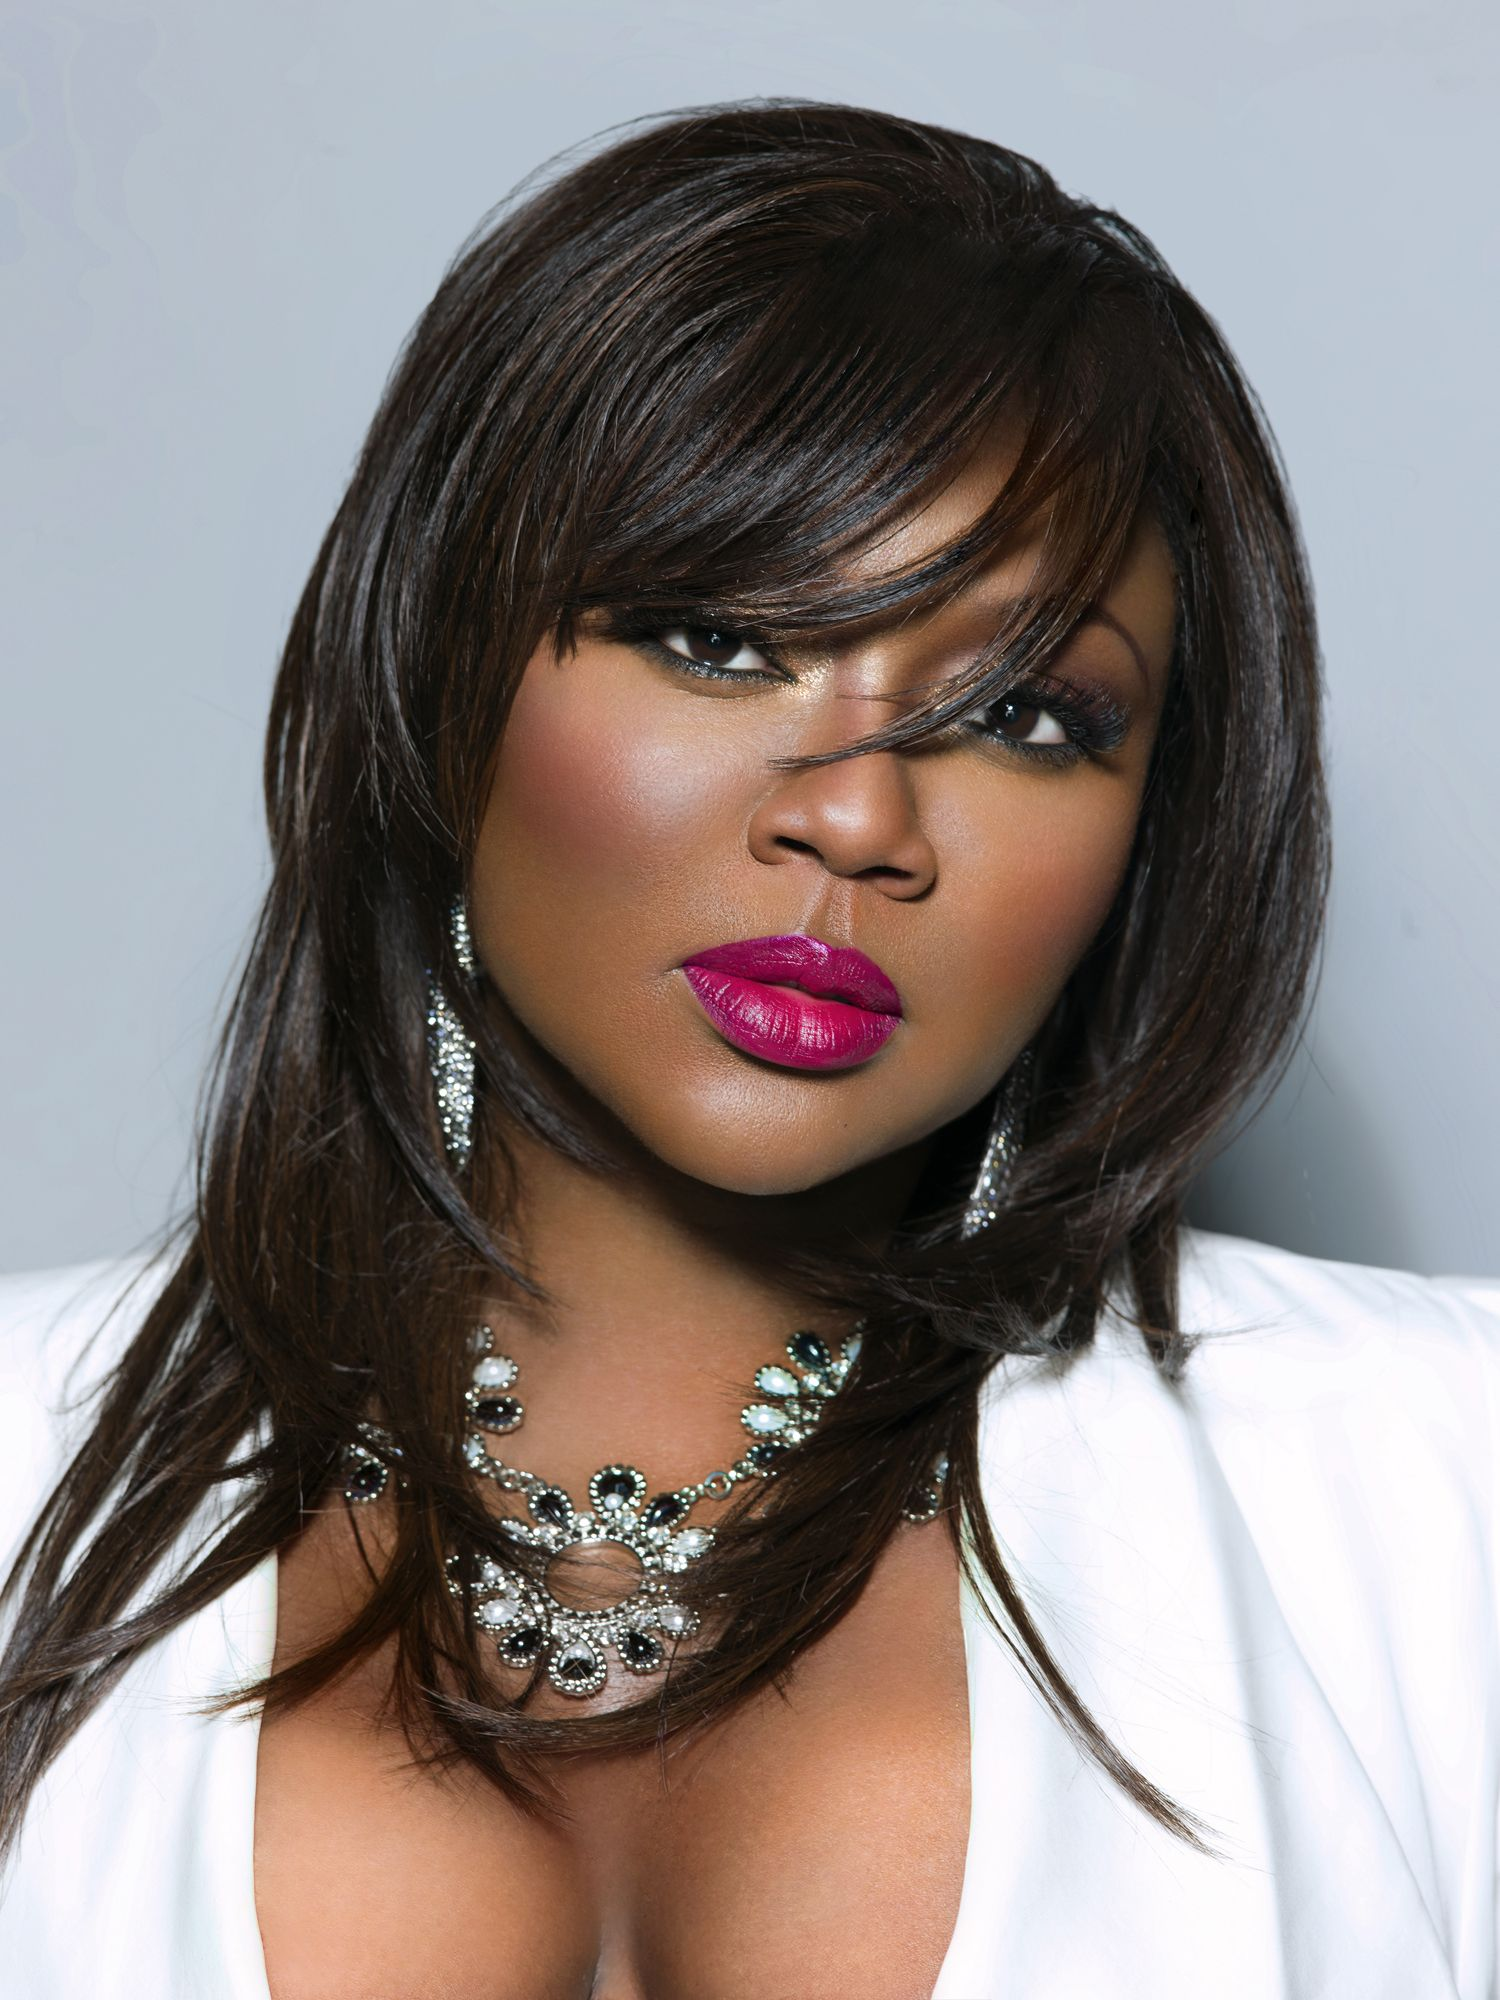 Latocha scott r u b singer songwriter and occasional actress